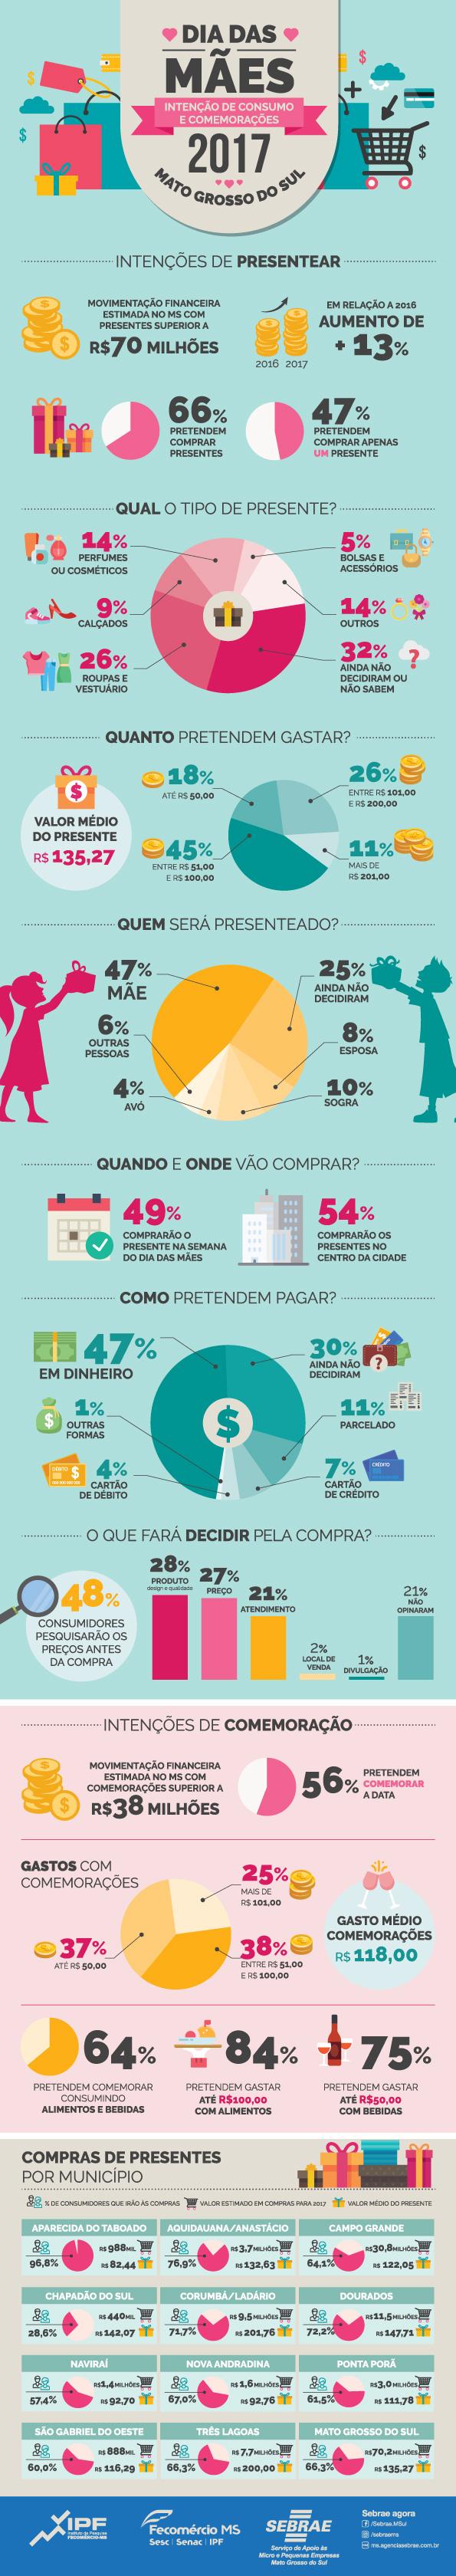 Infográfico Dia das Mães - SEBRAE MS